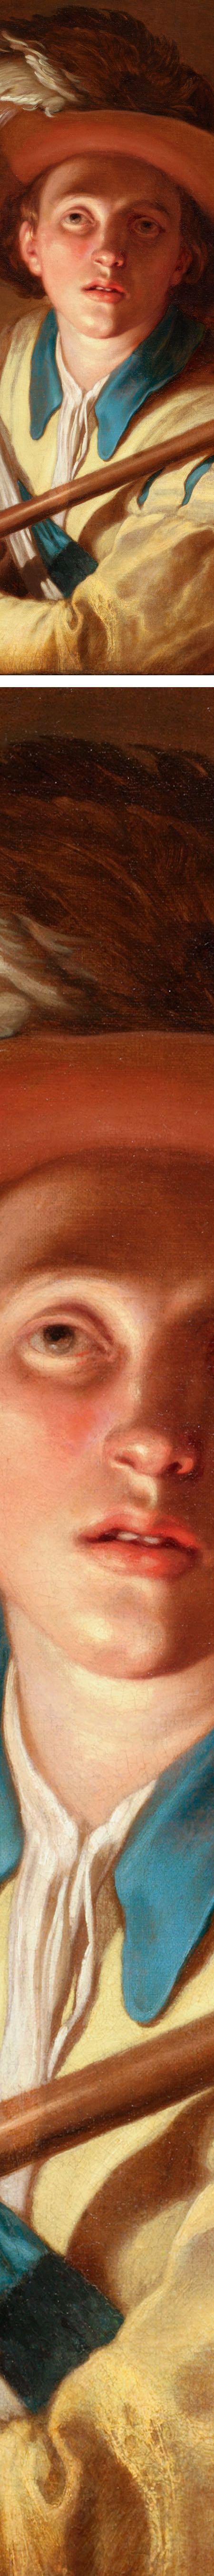 The Flute Player, Abraham Bloemaert, details